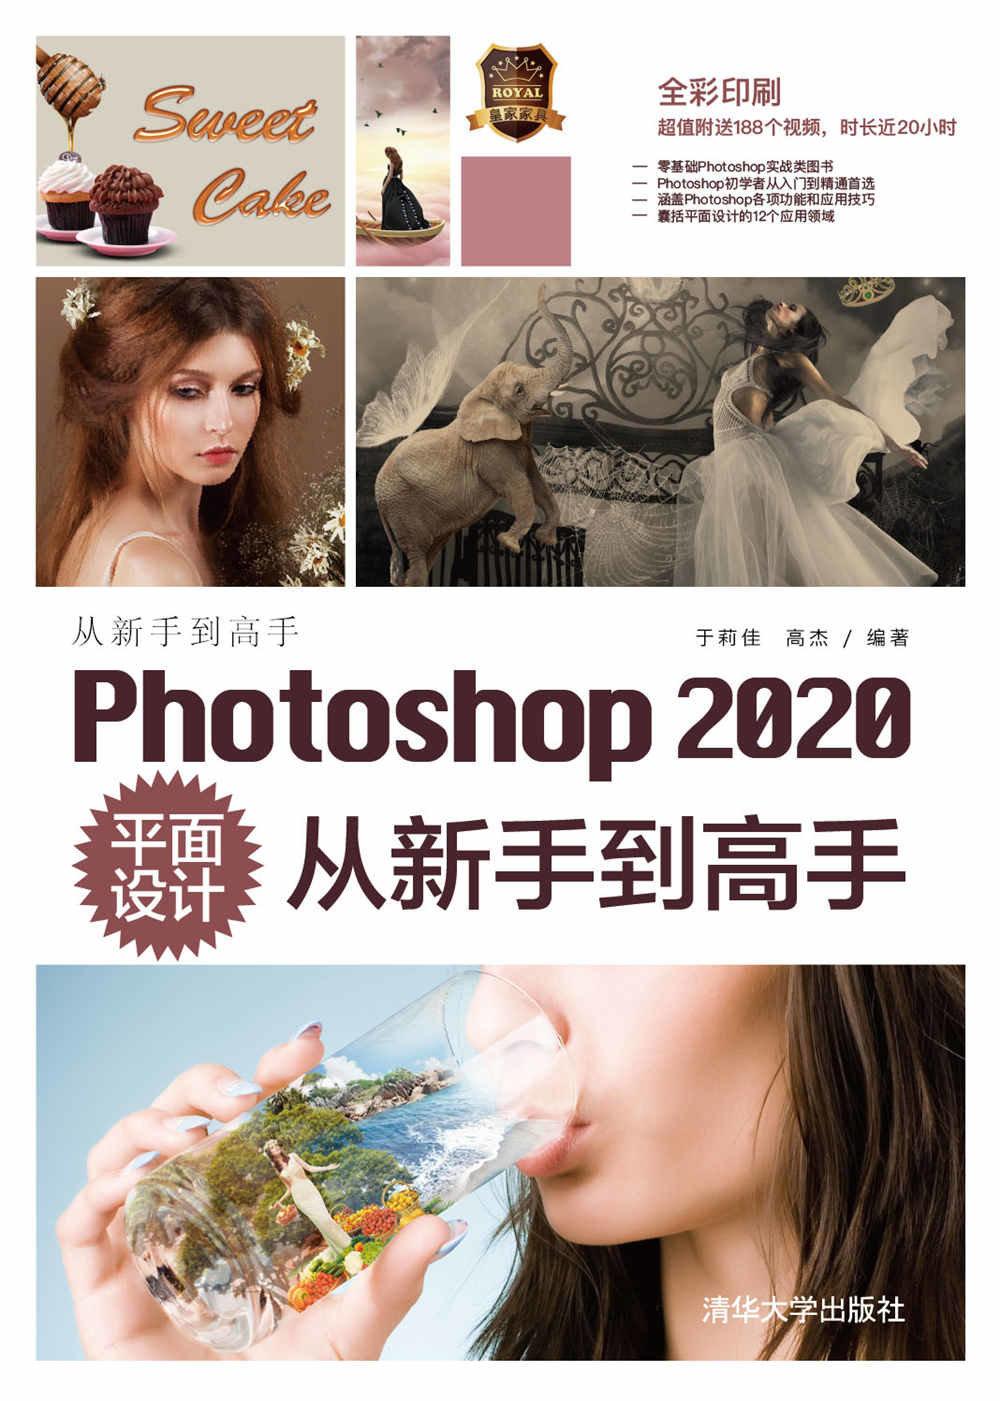 Photoshop 2020平面設計從新手到高手-preview-1